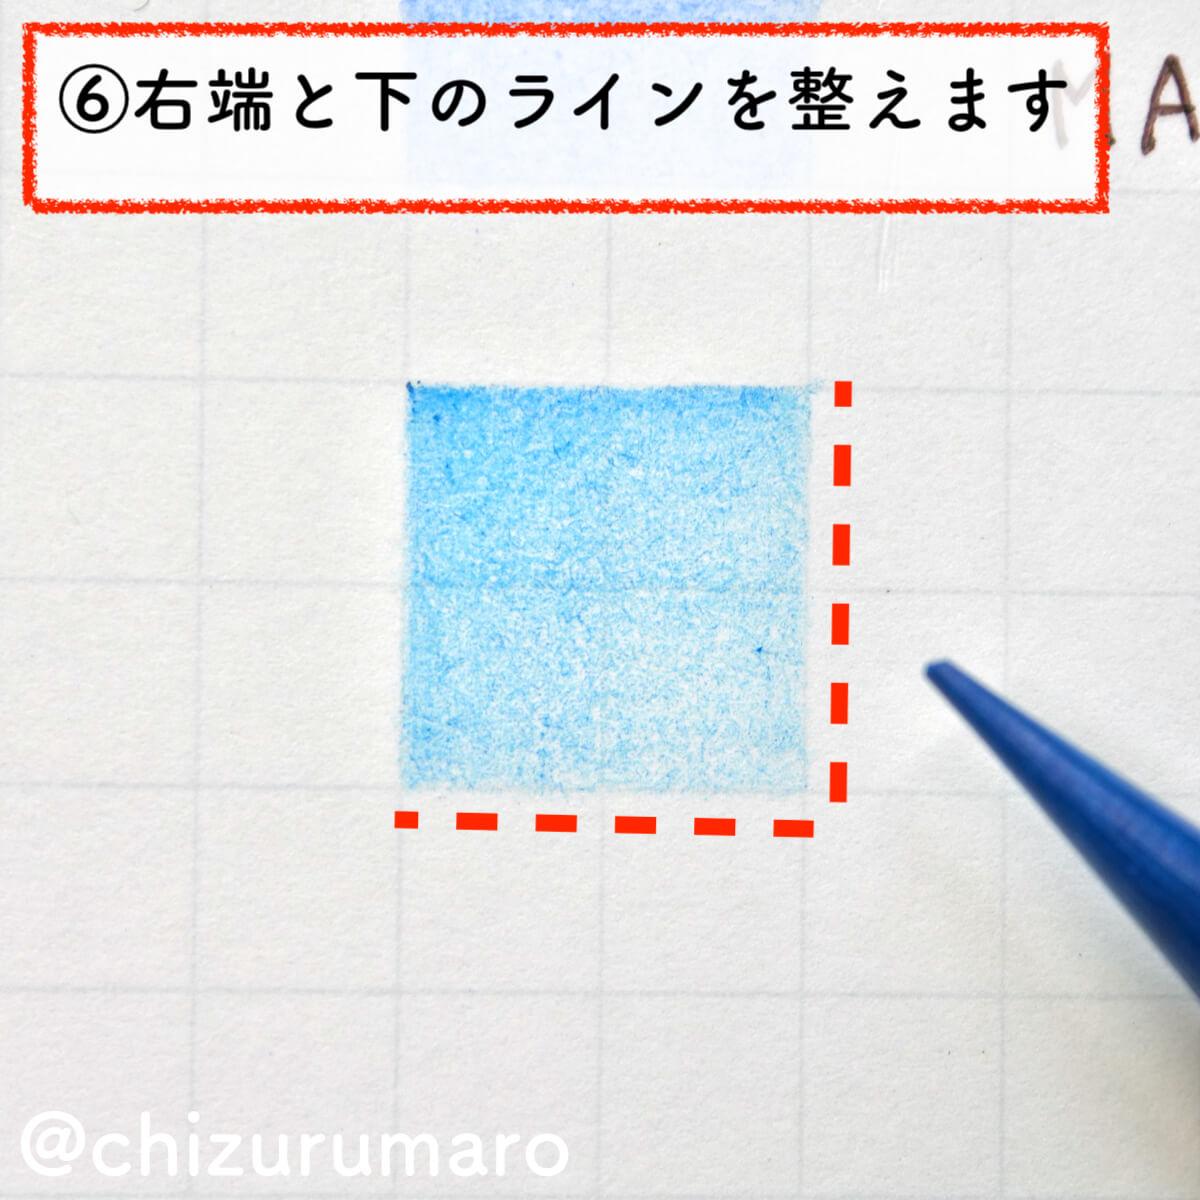 f:id:chizurumaro:20200921220159j:plain